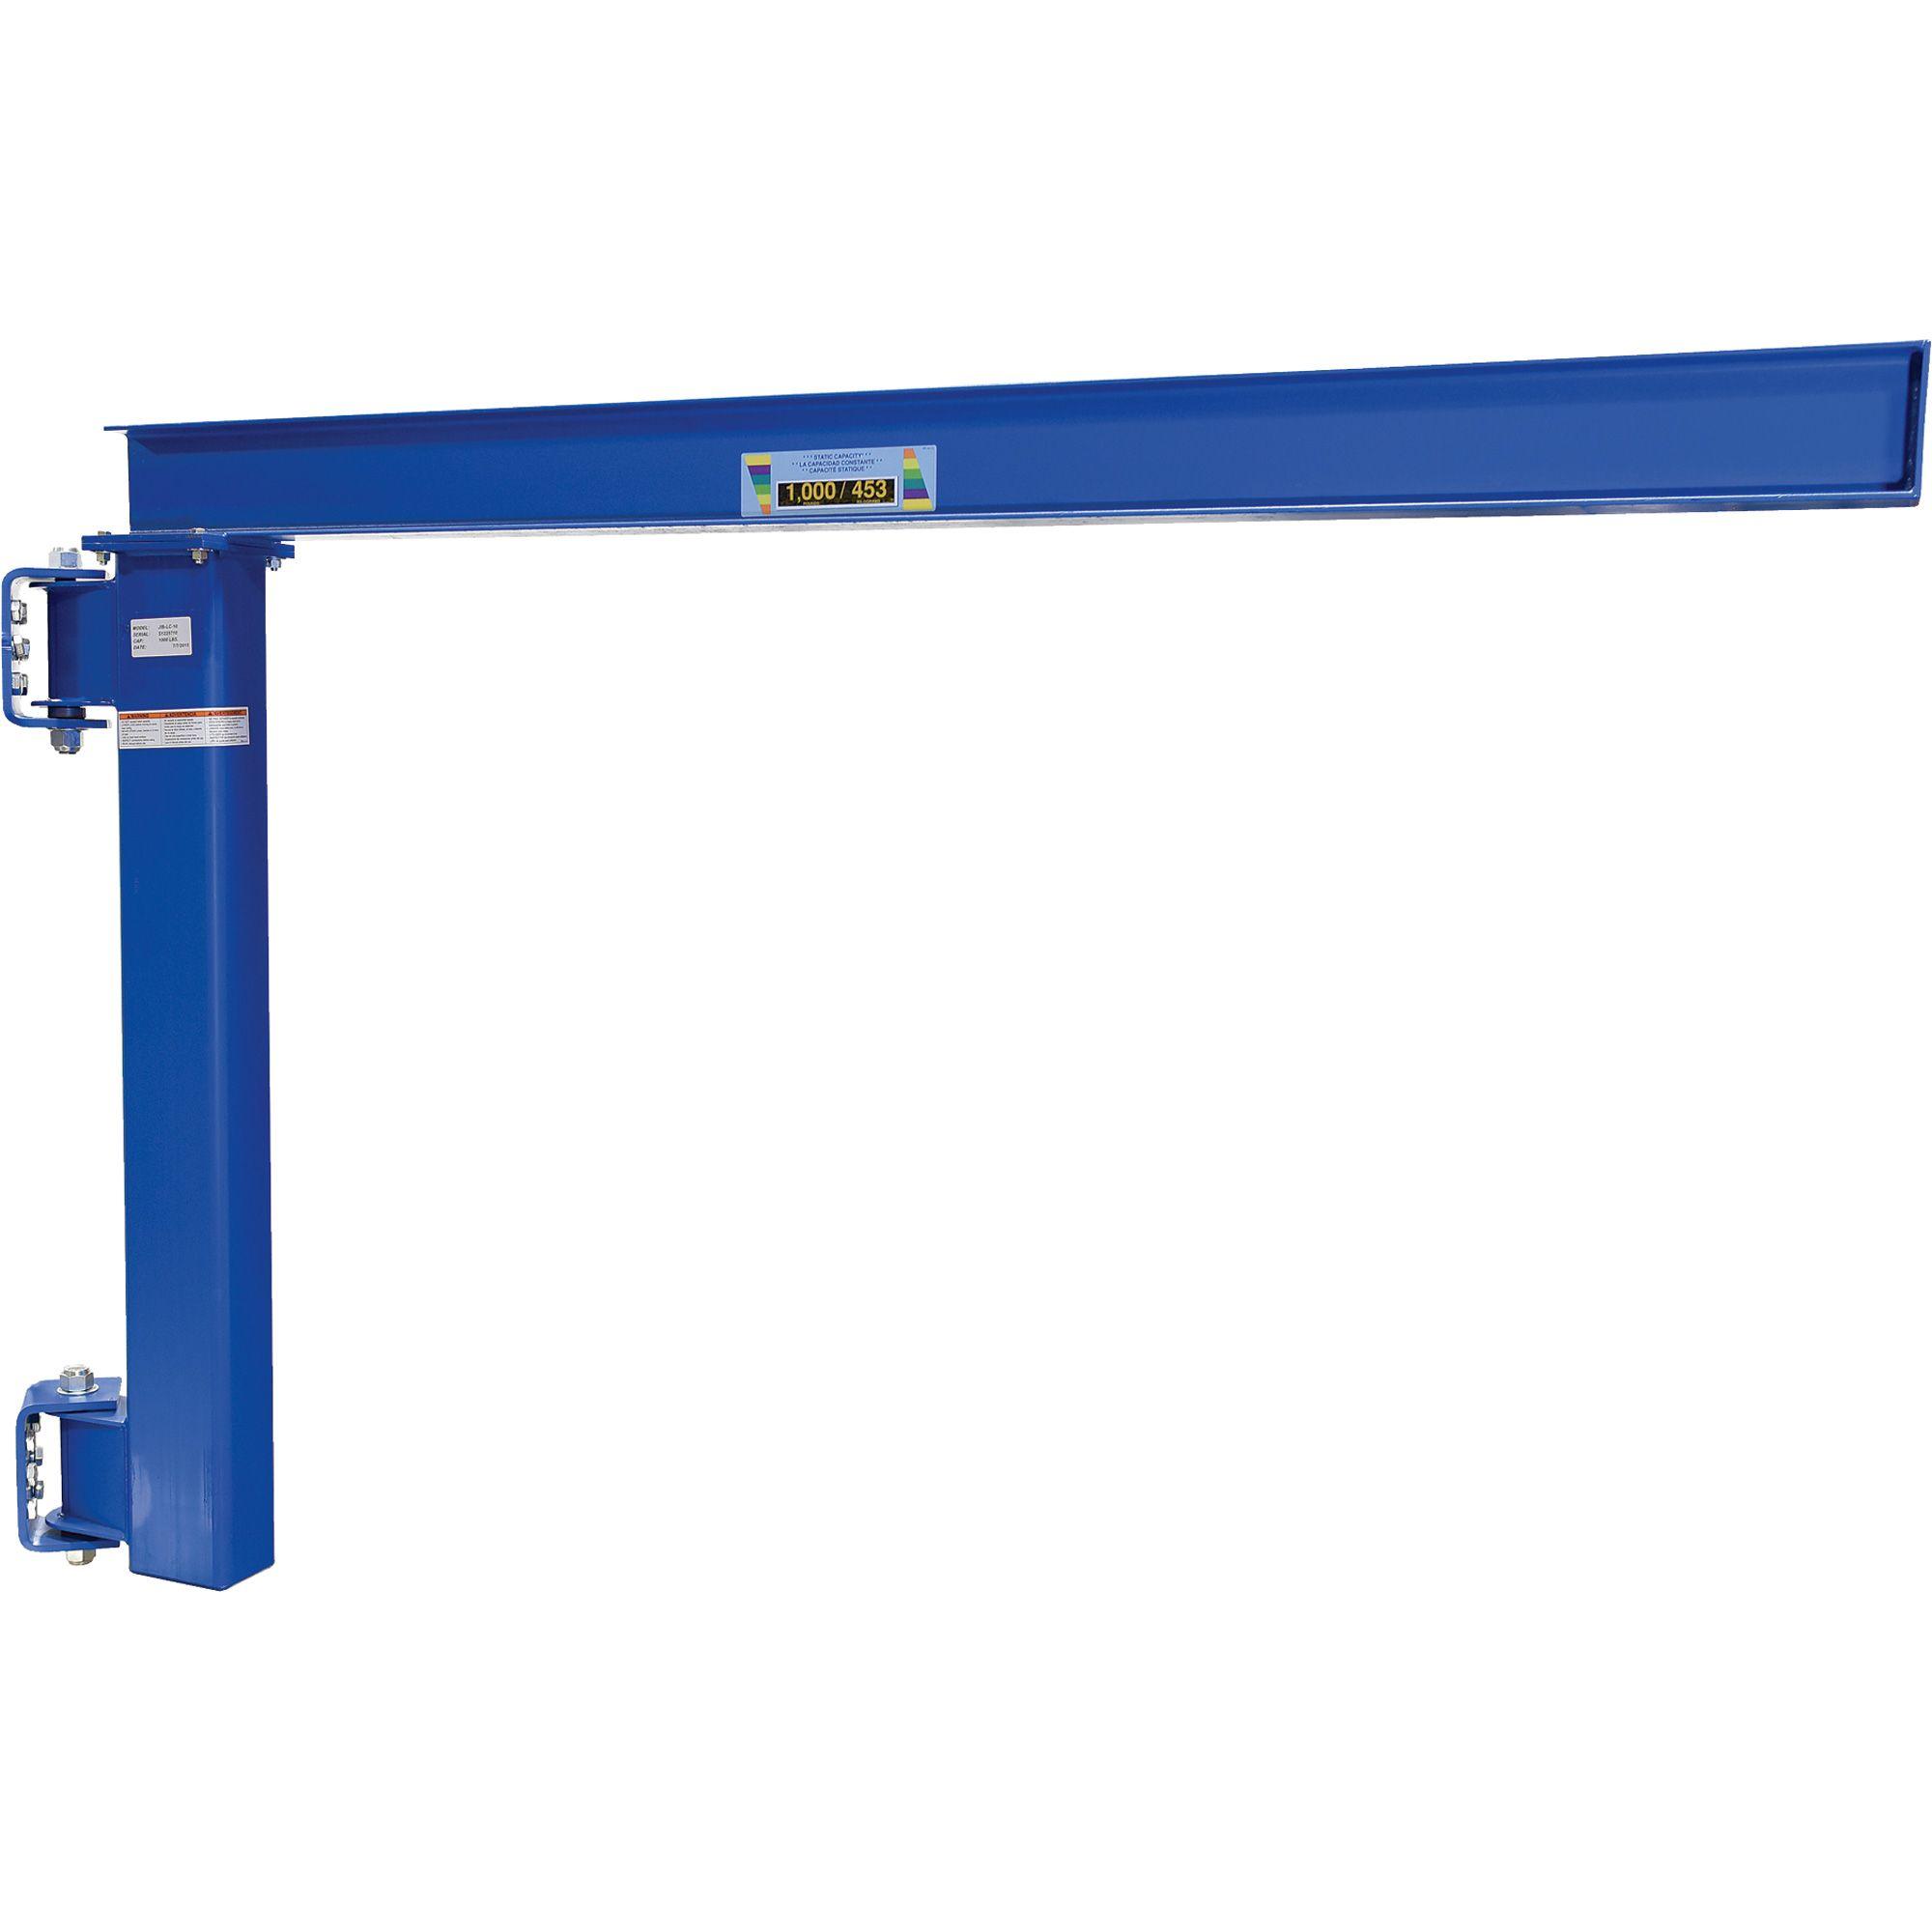 Vestil Wall Mounted Jib Crane For Low Ceilings Jib Cranes Low Ceiling Vestil Garage Hoist